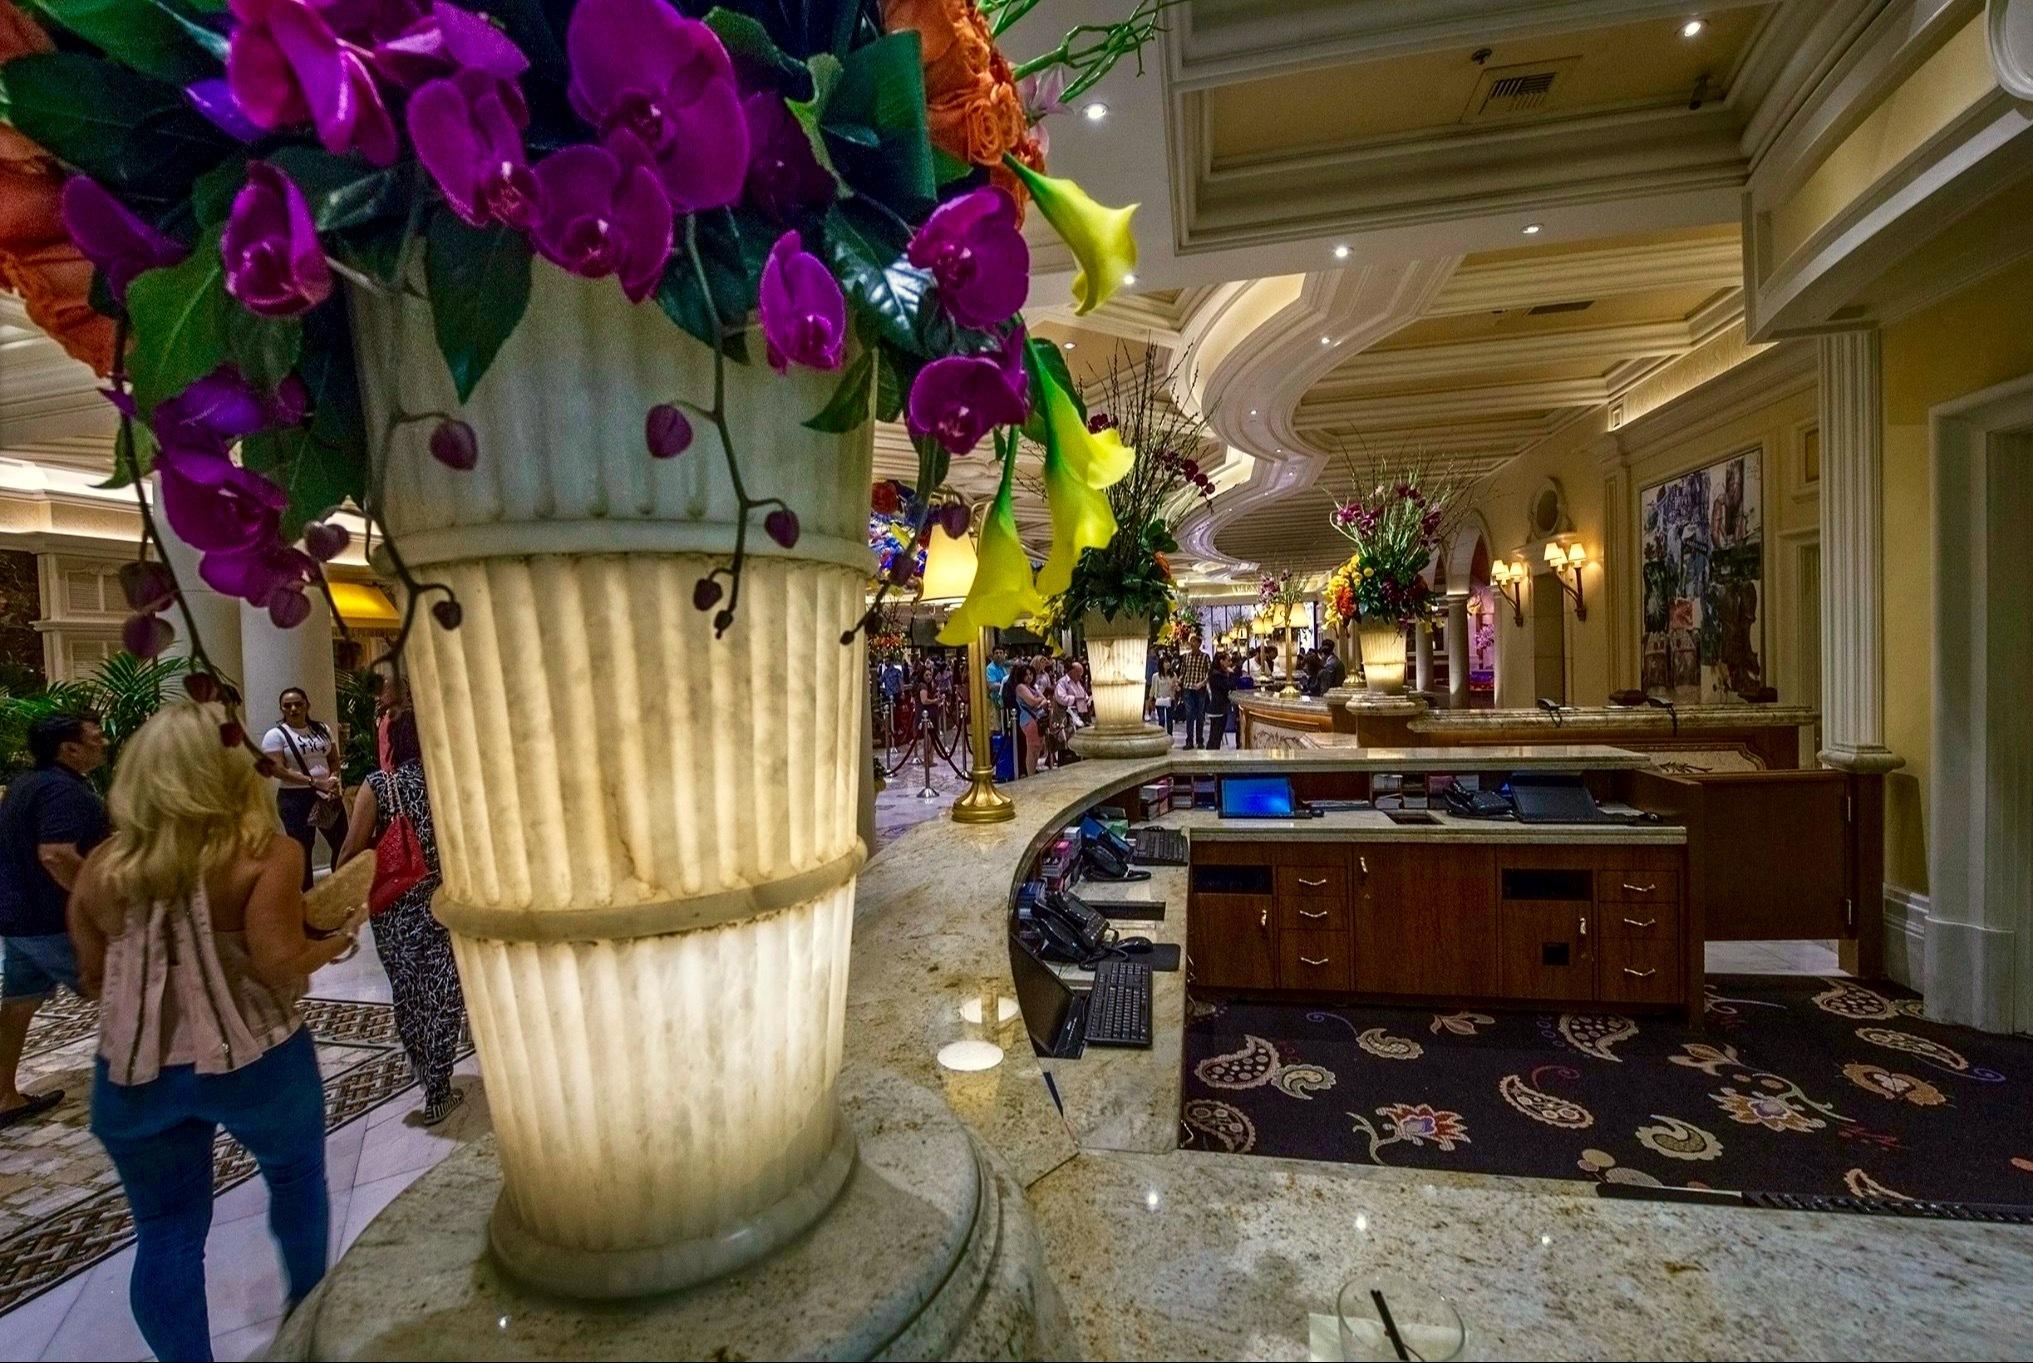 Luxury Hotel Bellagio- Las Vegas,Nevada by Walter Novak